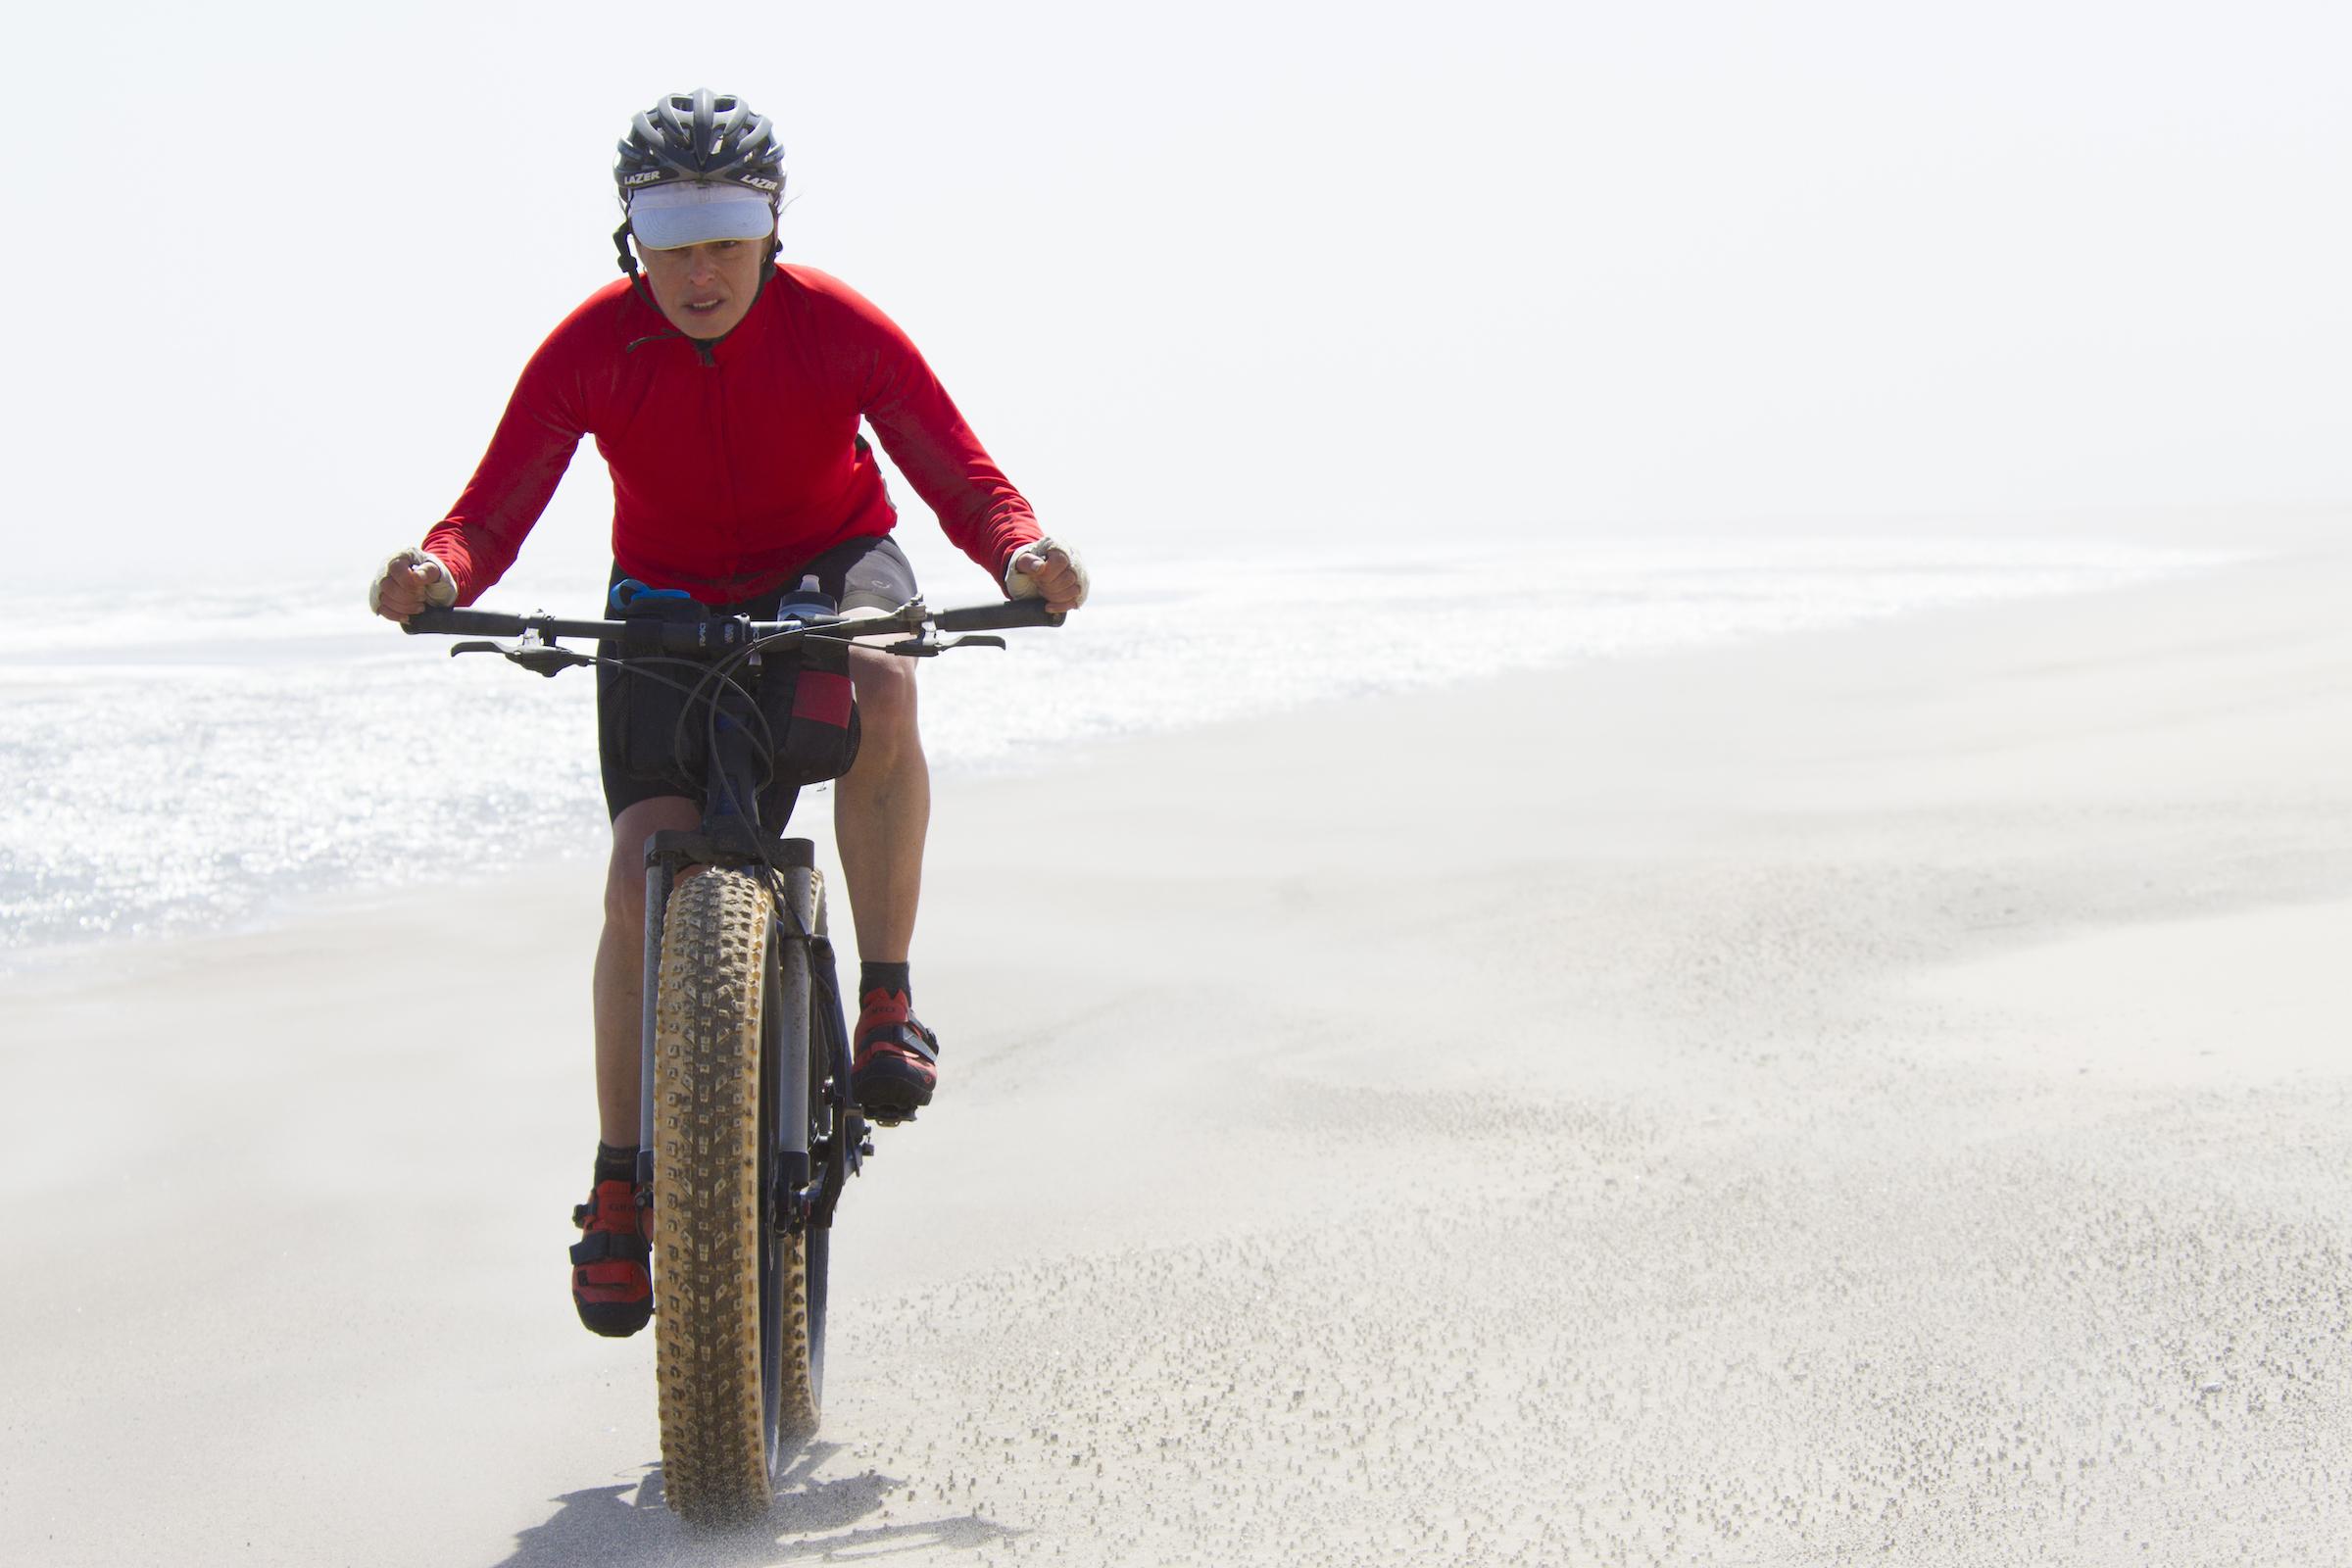 kate lemming cycling across hot white desert sand on a fat bike